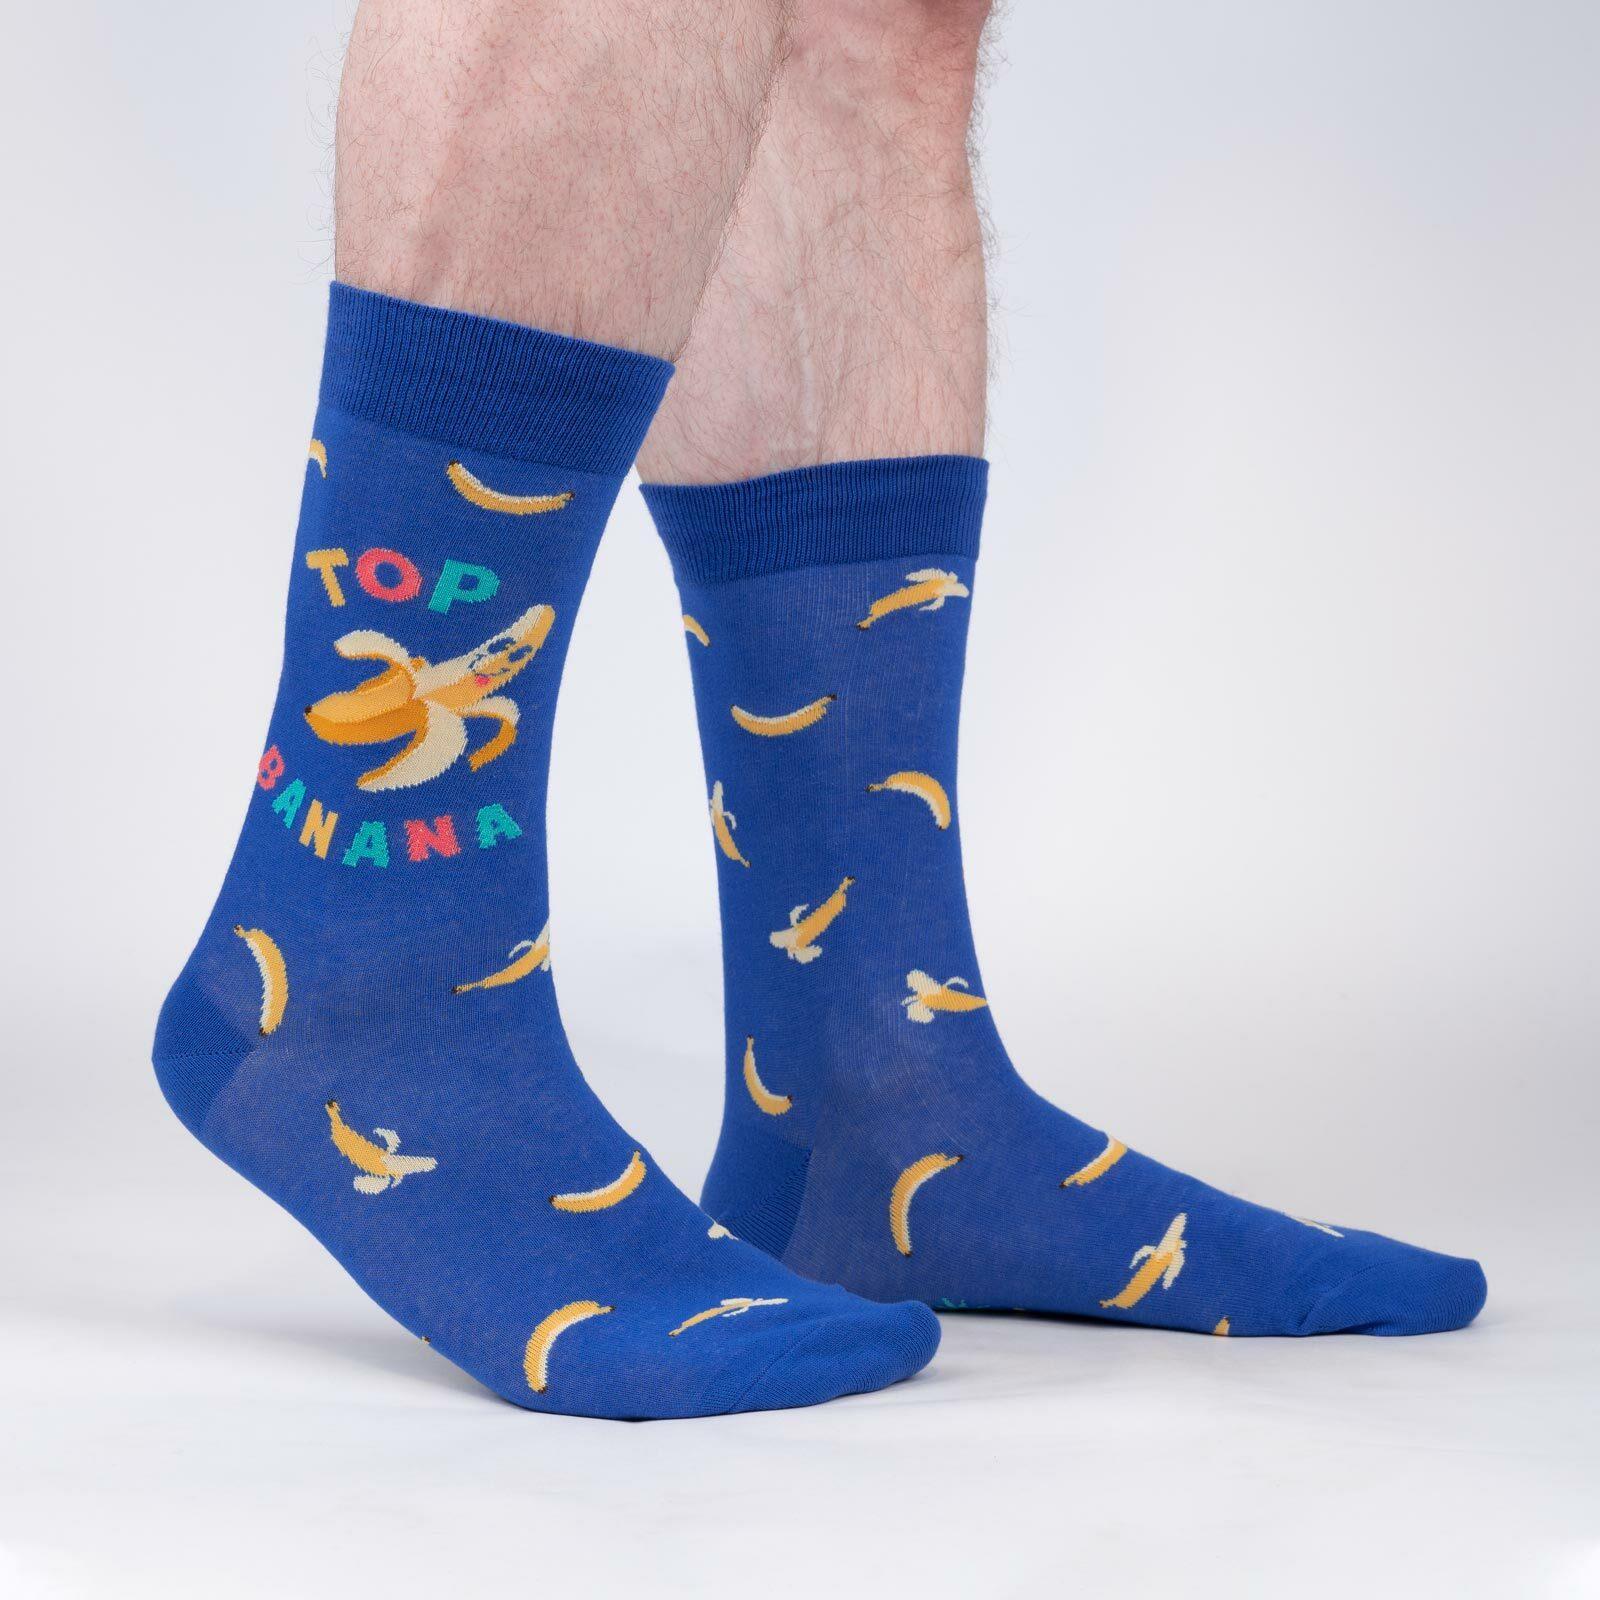 model wearing Top Banana - Funny Banana Crew Socks Blue - Men's